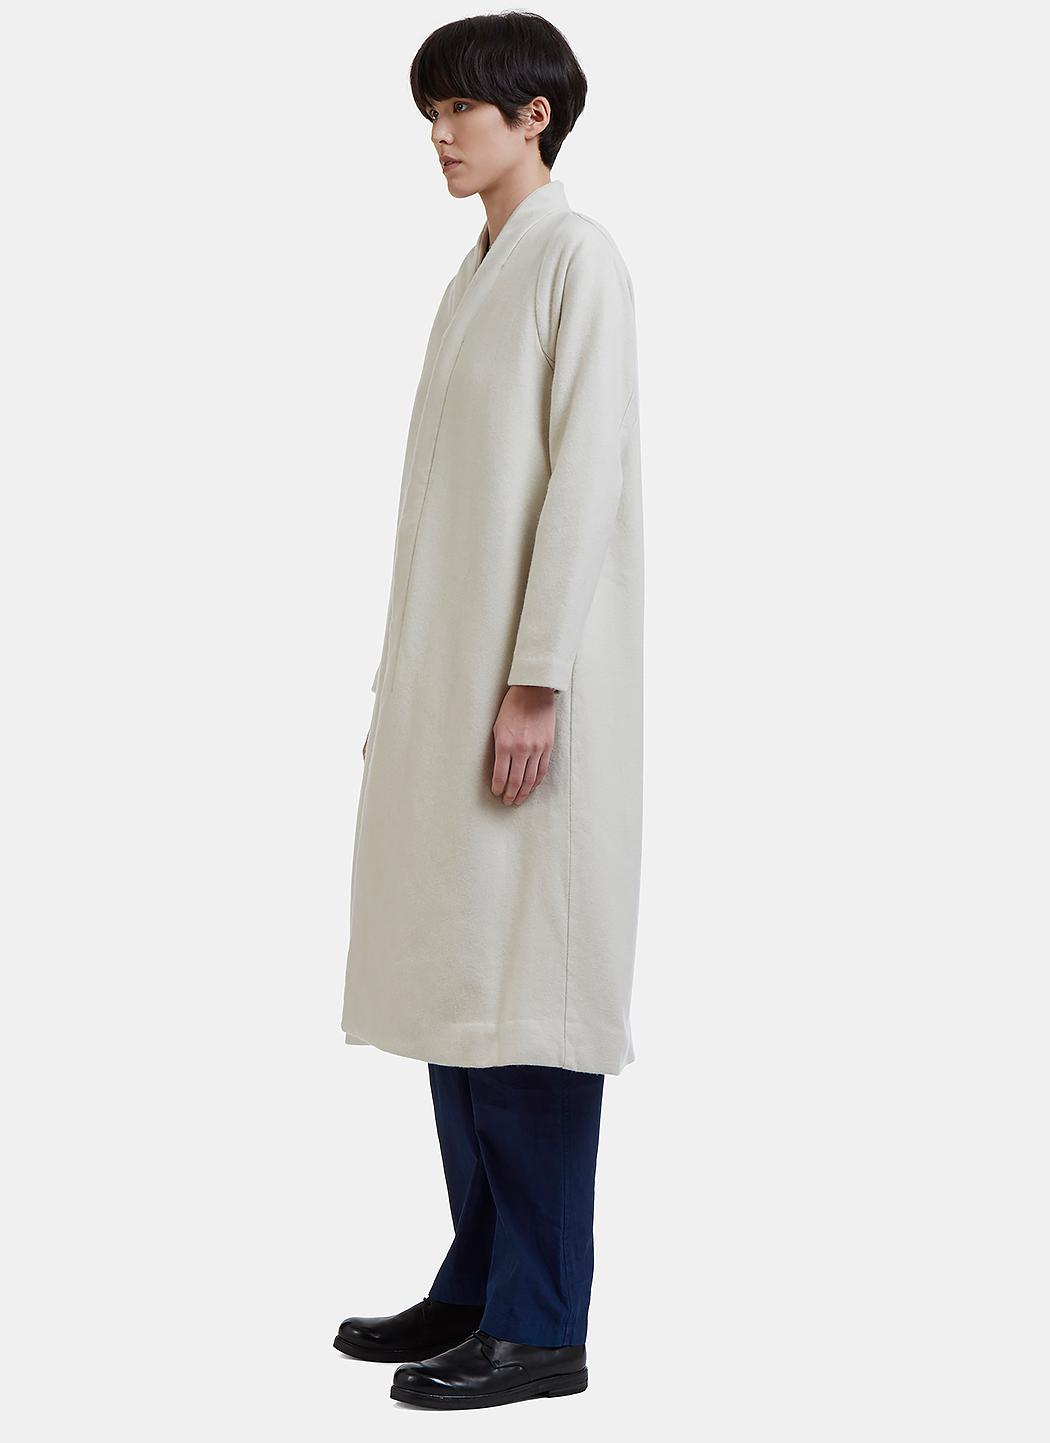 Herbal For Cosmic In White Men Fullscreen Dyed Lyst Coat View Wonder Wool rB5wqr0